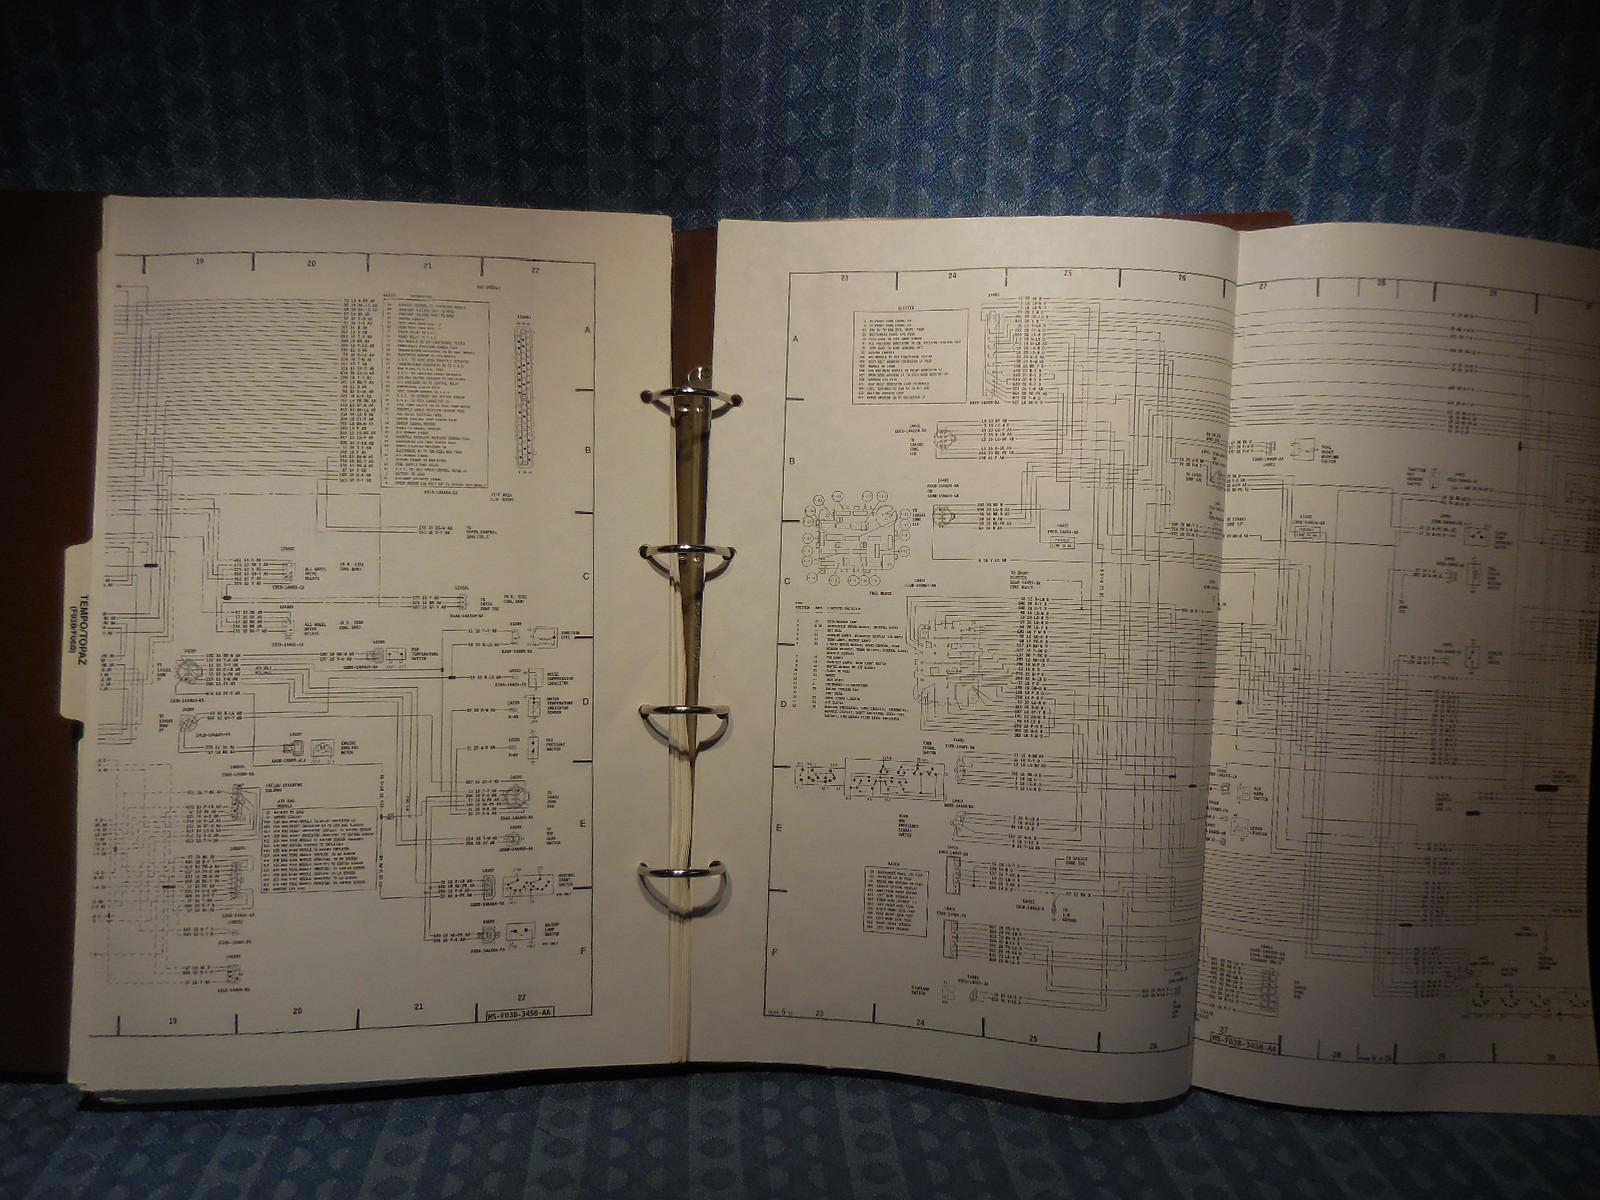 1990 mercury grand marquis wiring diagram 1990 ford lincoln mercury oem wiring   vacuum diagrams mark vii  1990 ford lincoln mercury oem wiring